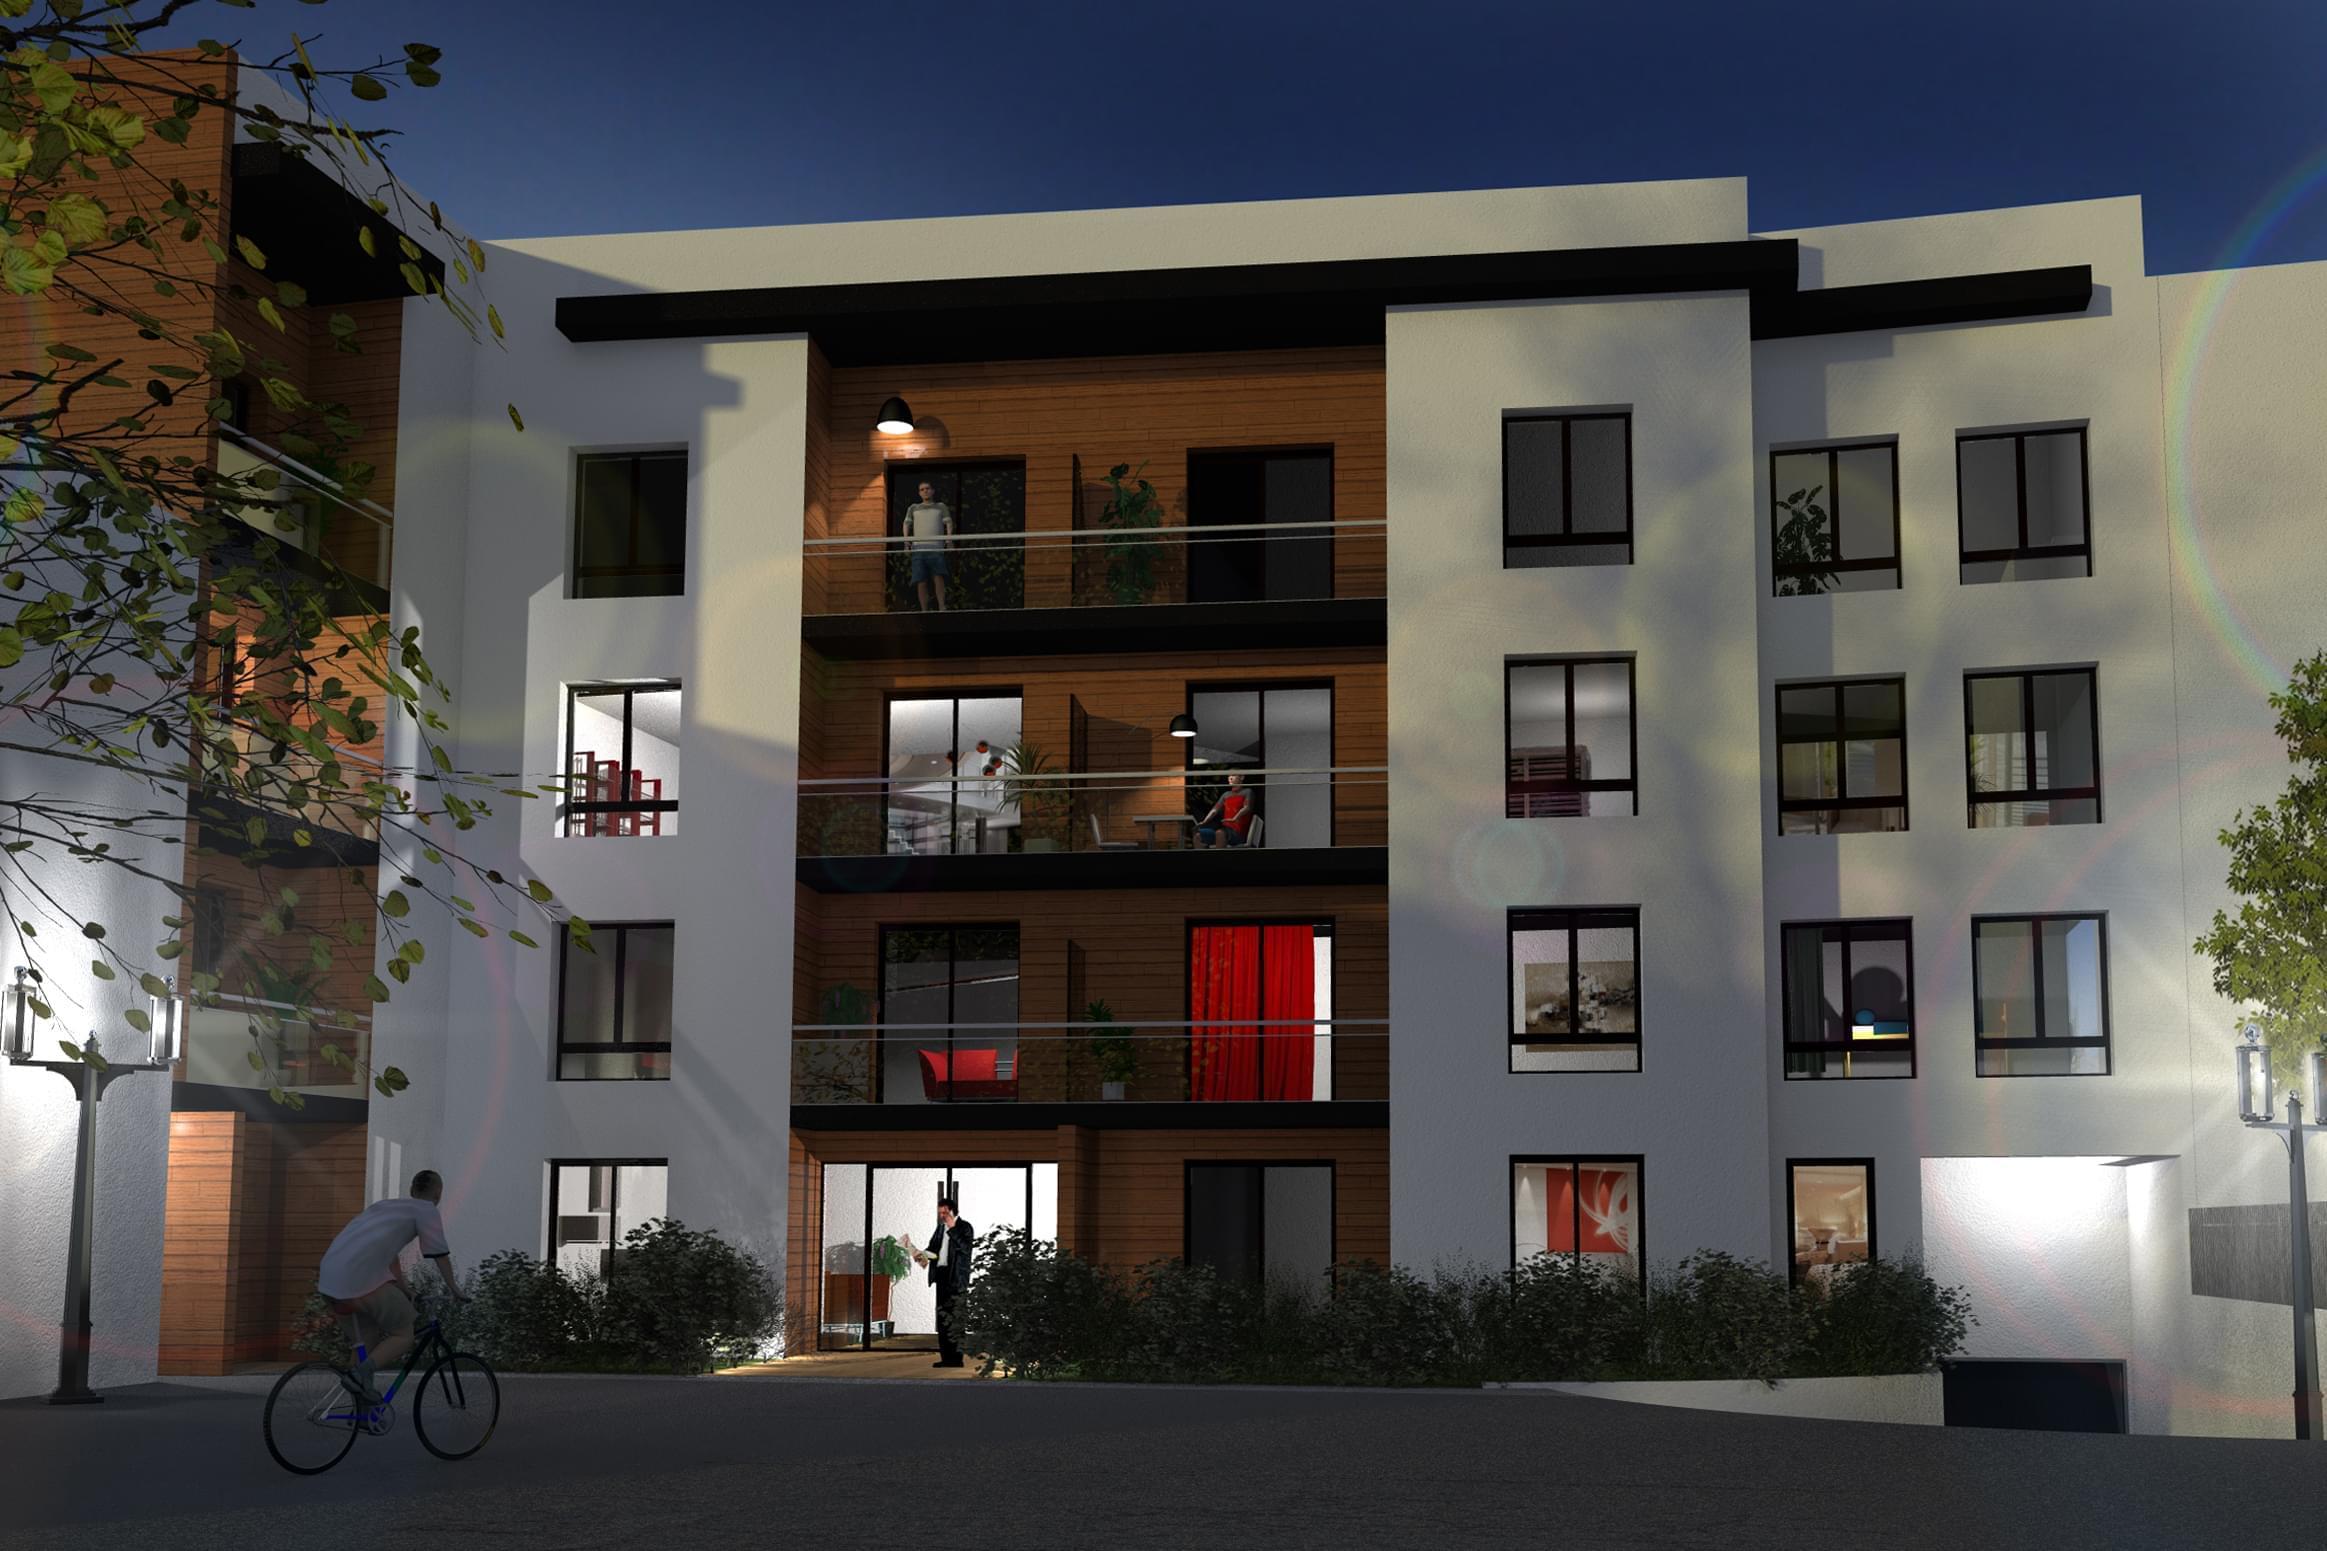 Programme immobilier neuf meyzieu carr r publique for Programme immobilier